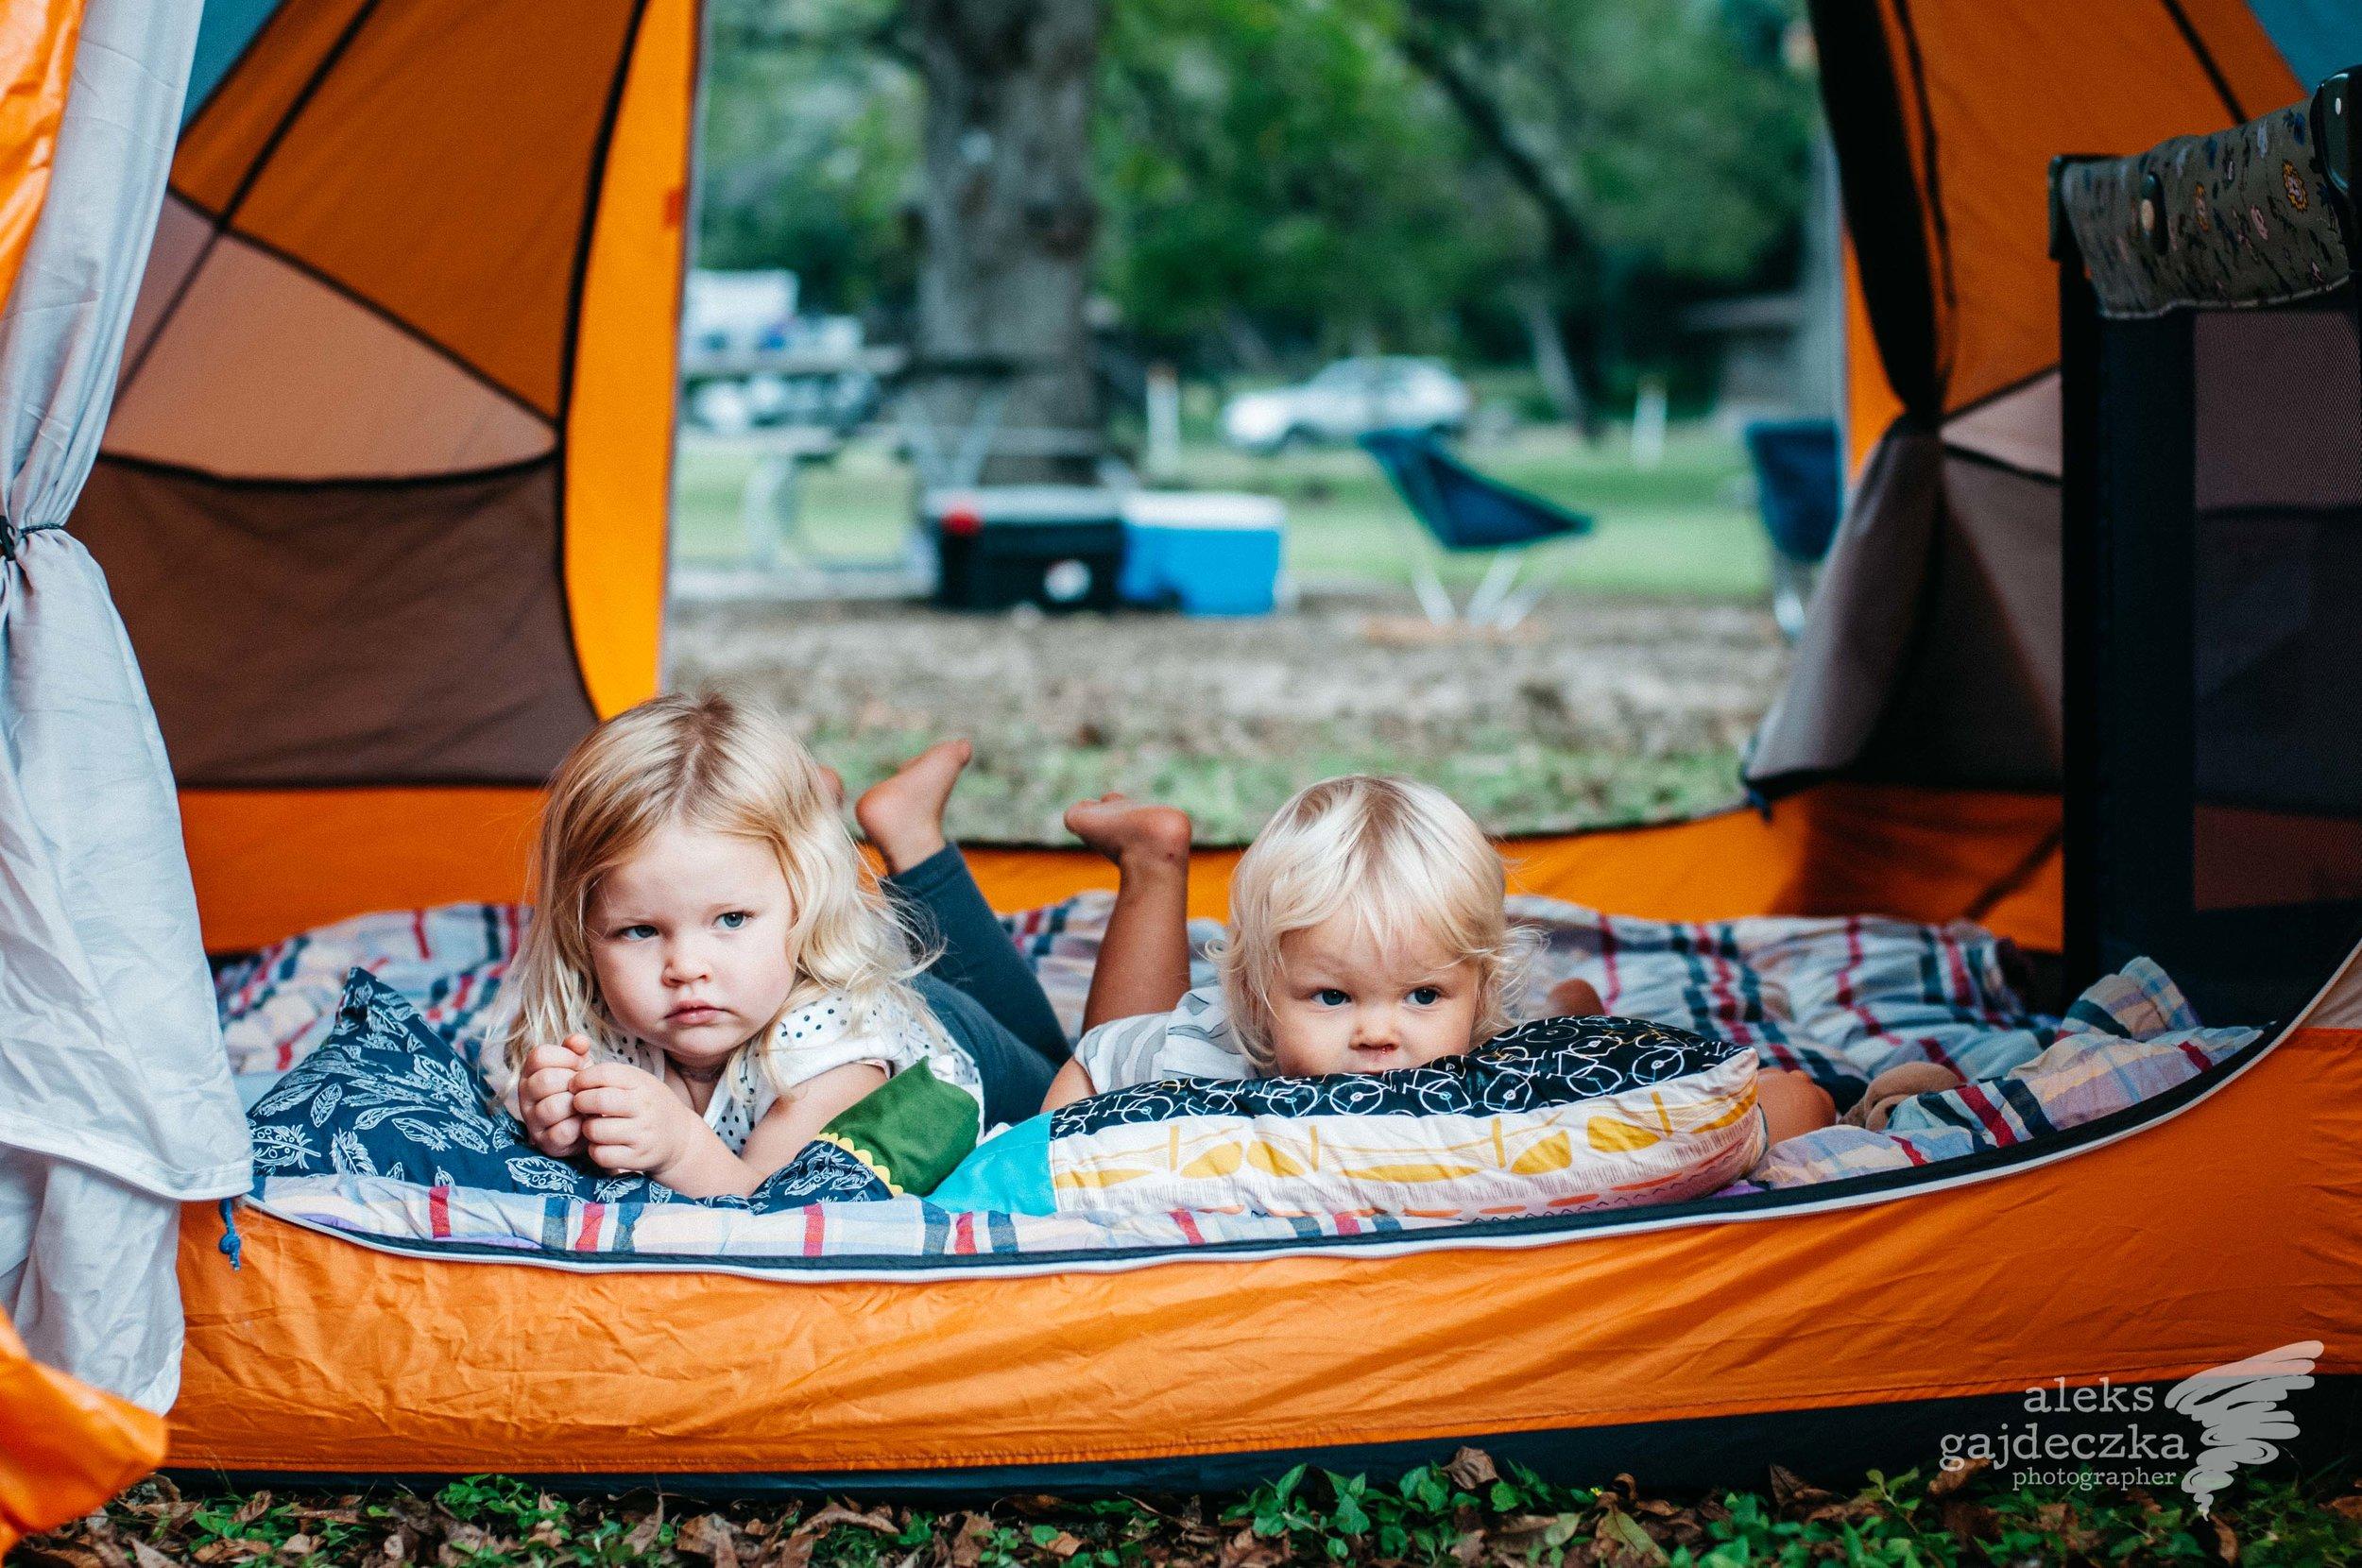 austin-family-photography-camping.jpg